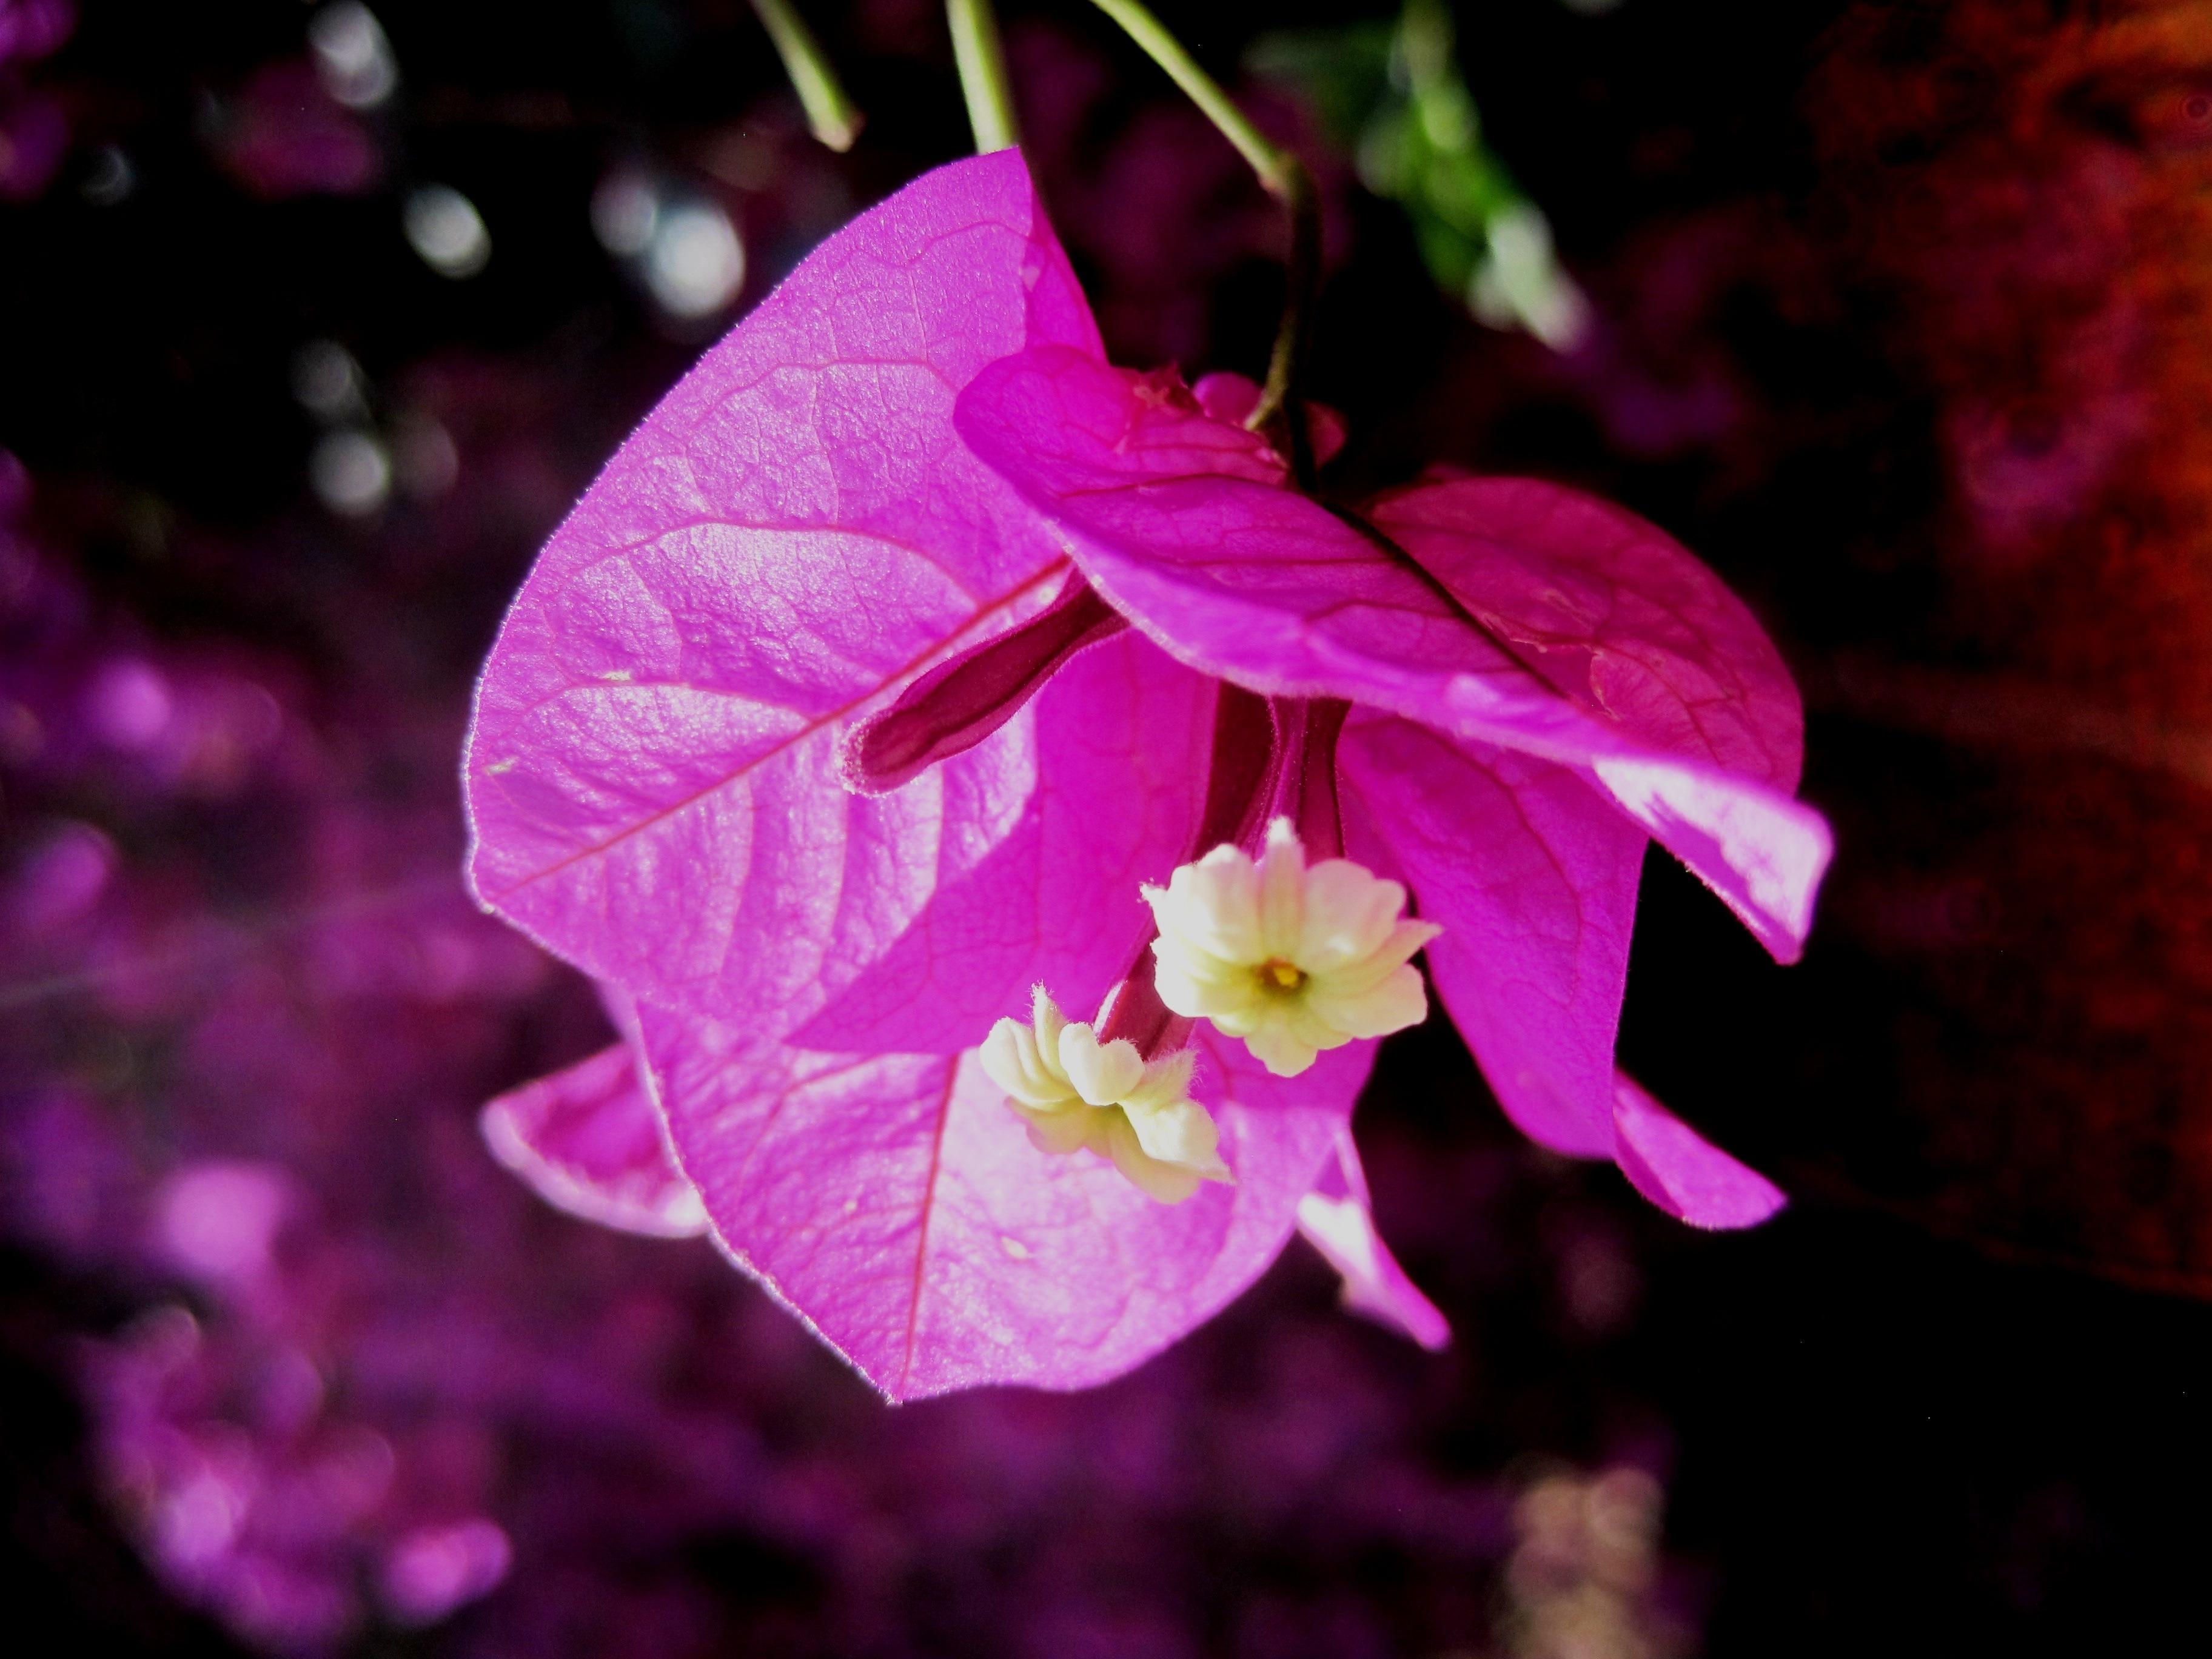 Free Images Blossom Light Leaf Flower Purple Petal Bloom